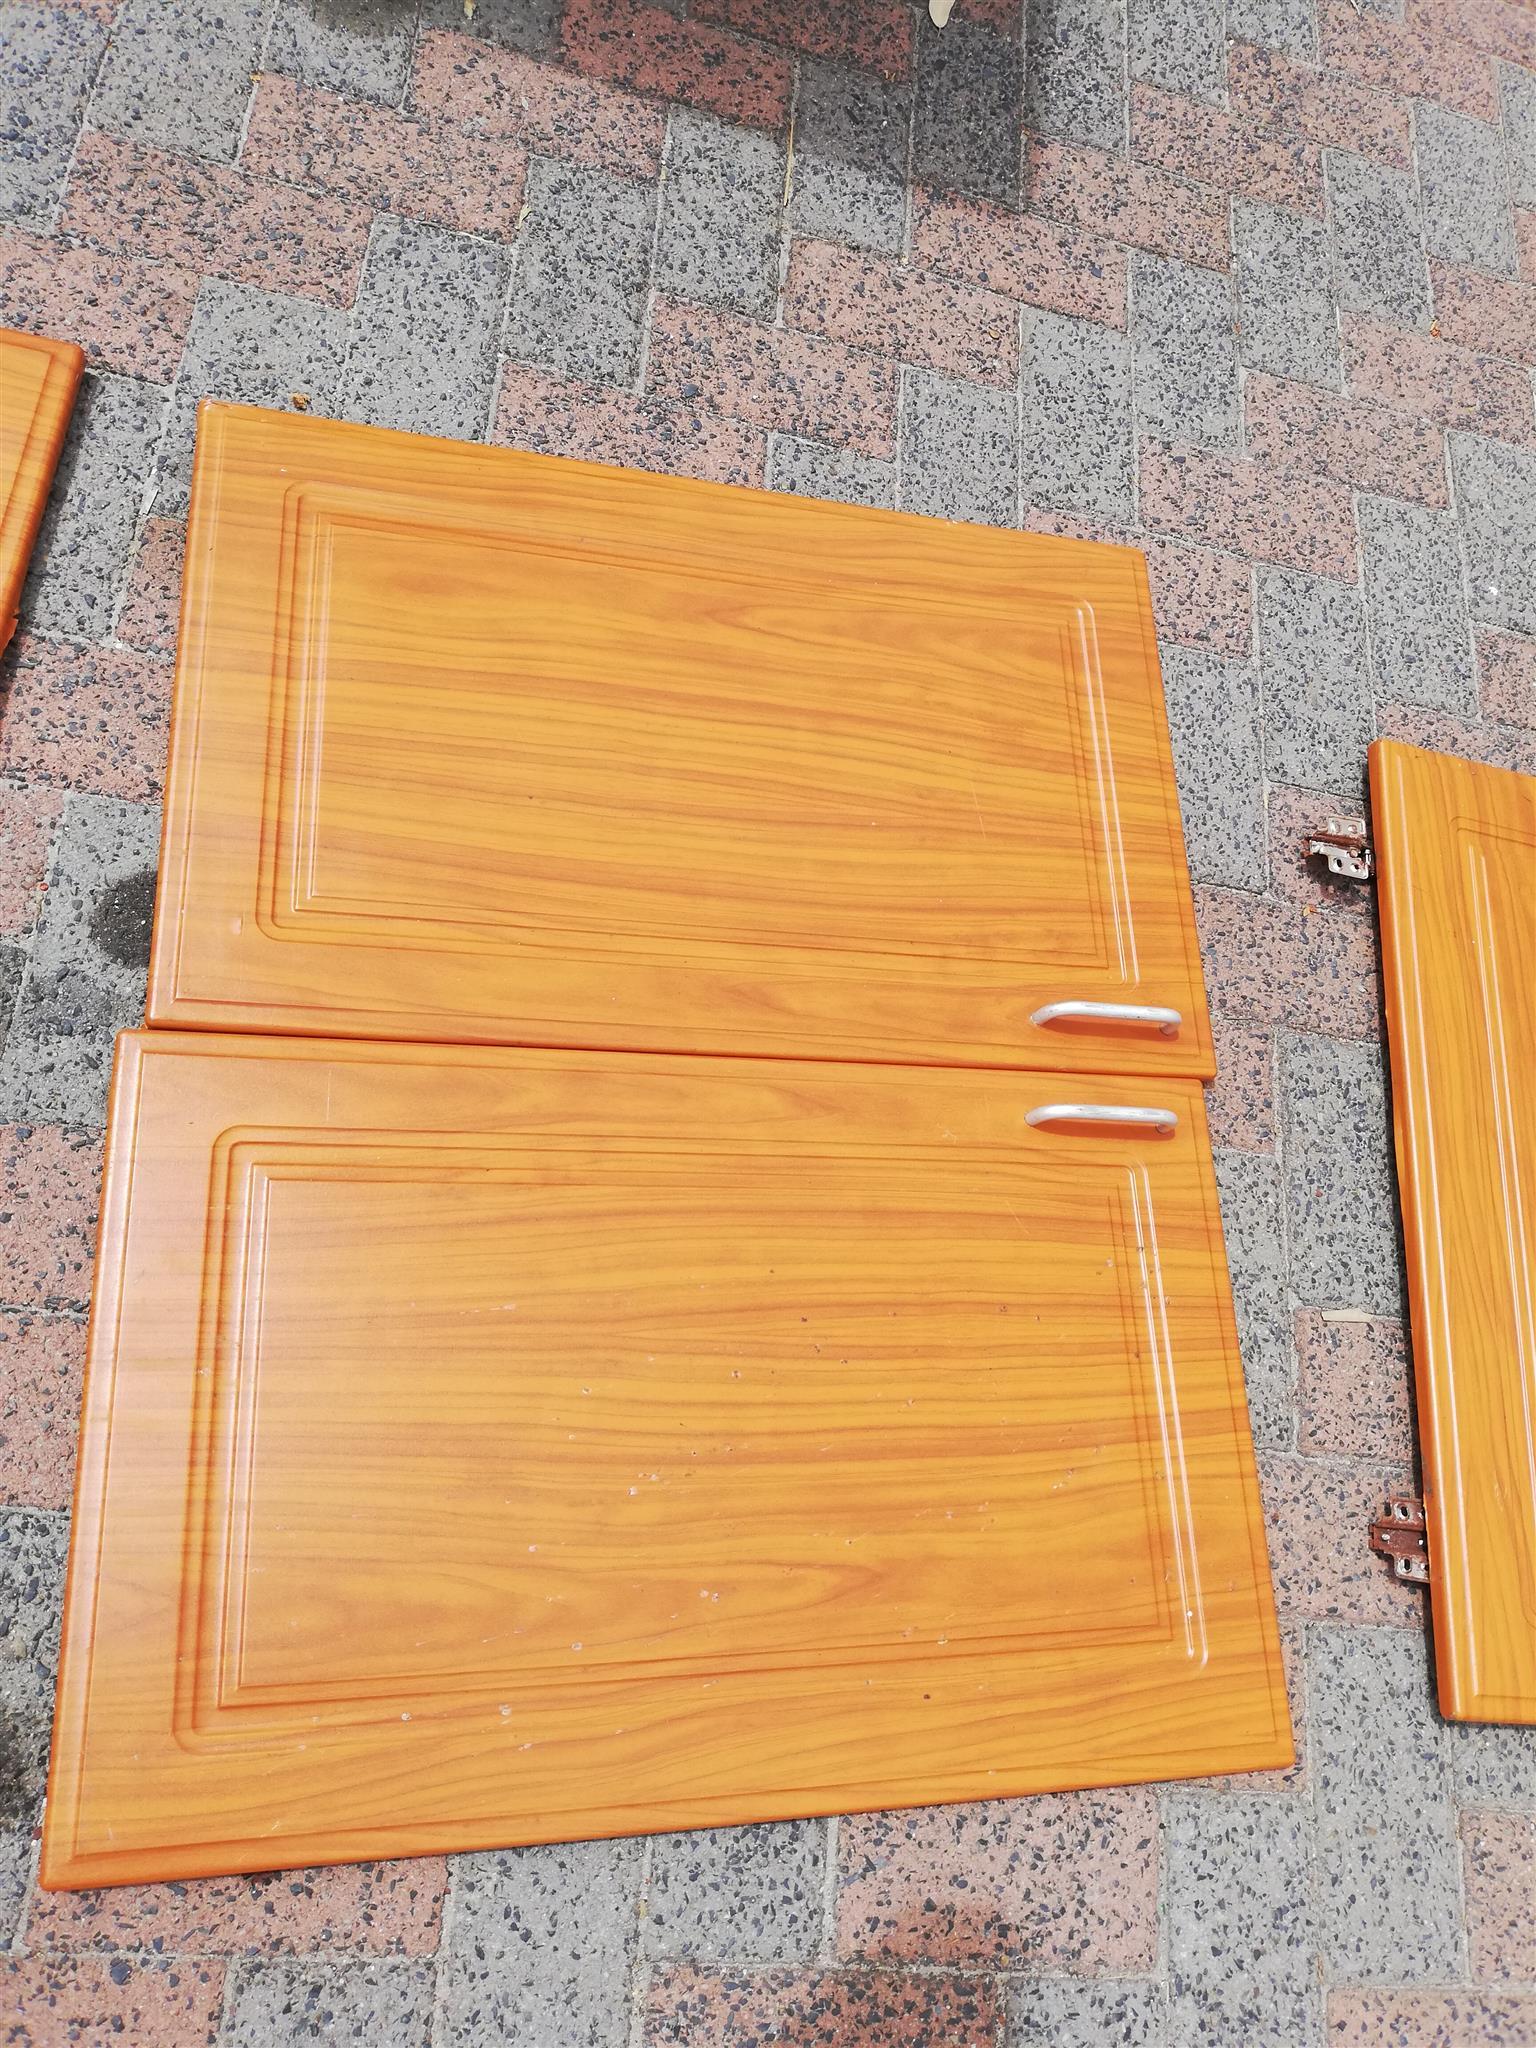 Cherry Royal finish kitchen doors and draws